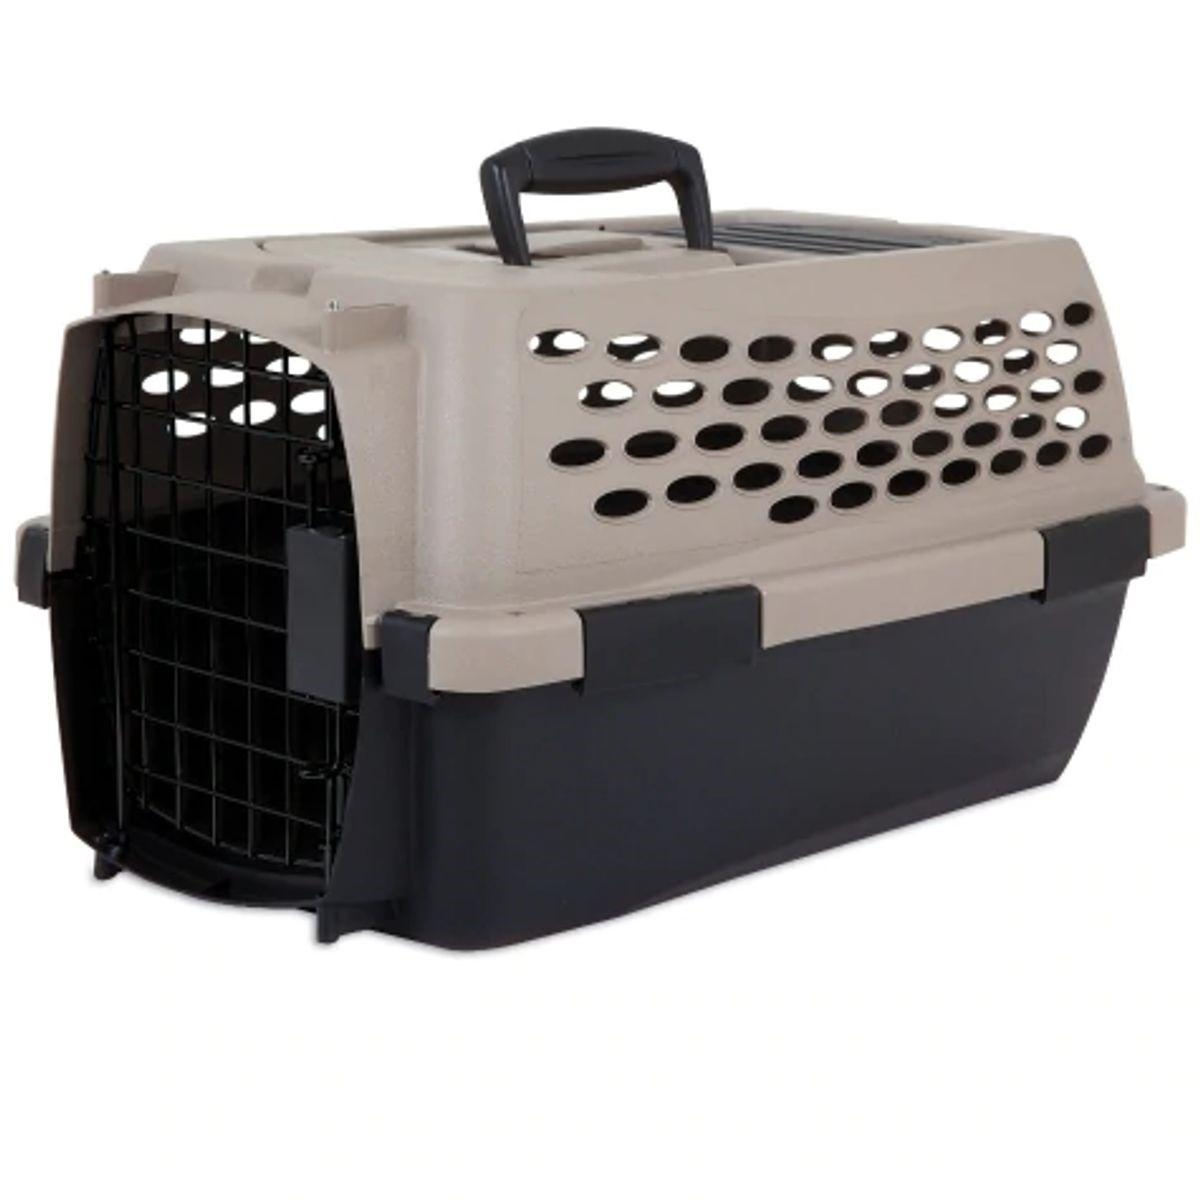 Petmate Vari Kennel Pet Carrier, Taupe/Black, 32-in, 32-in